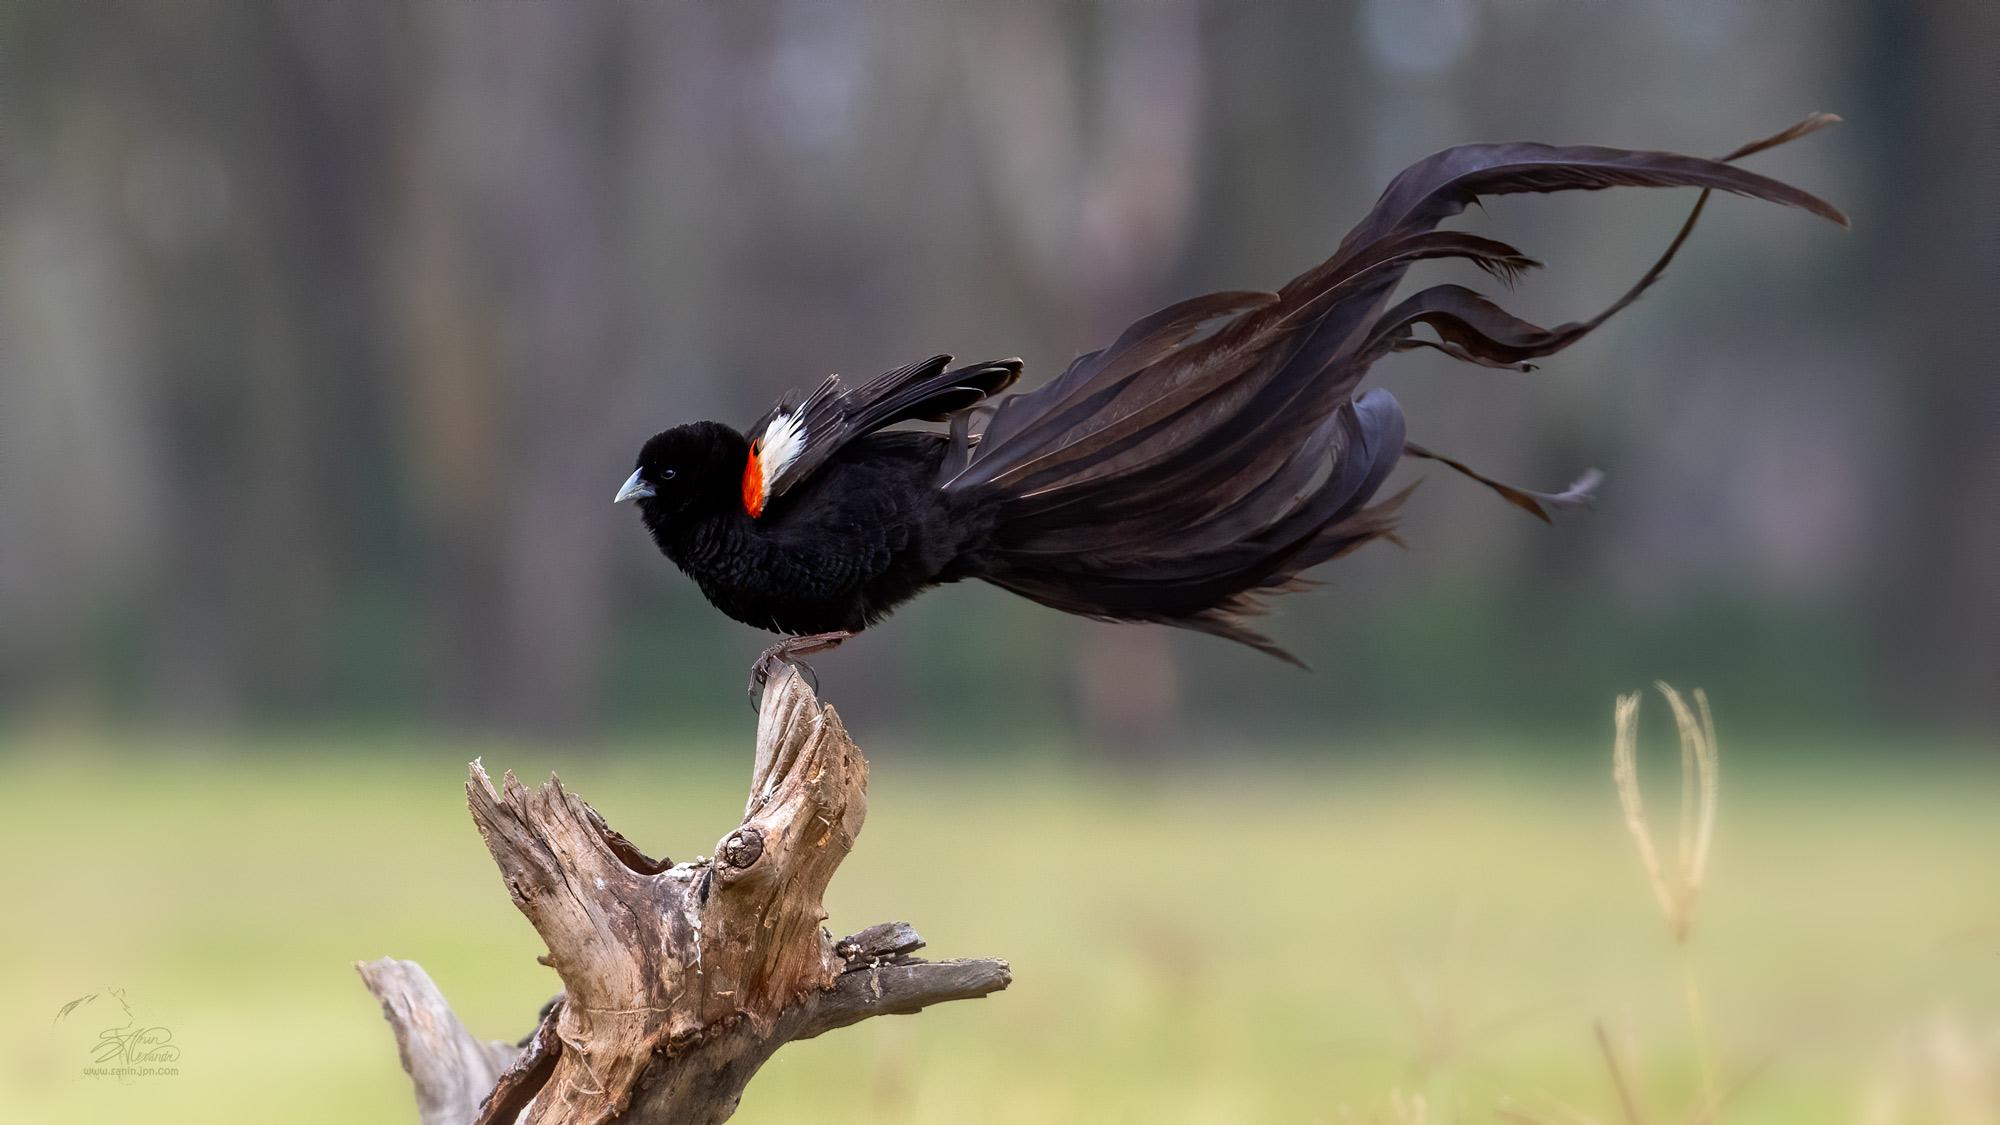 Long-tailed widow bird (Длиннохвостый бархатный ткач) in Nakuru NP, Kenya